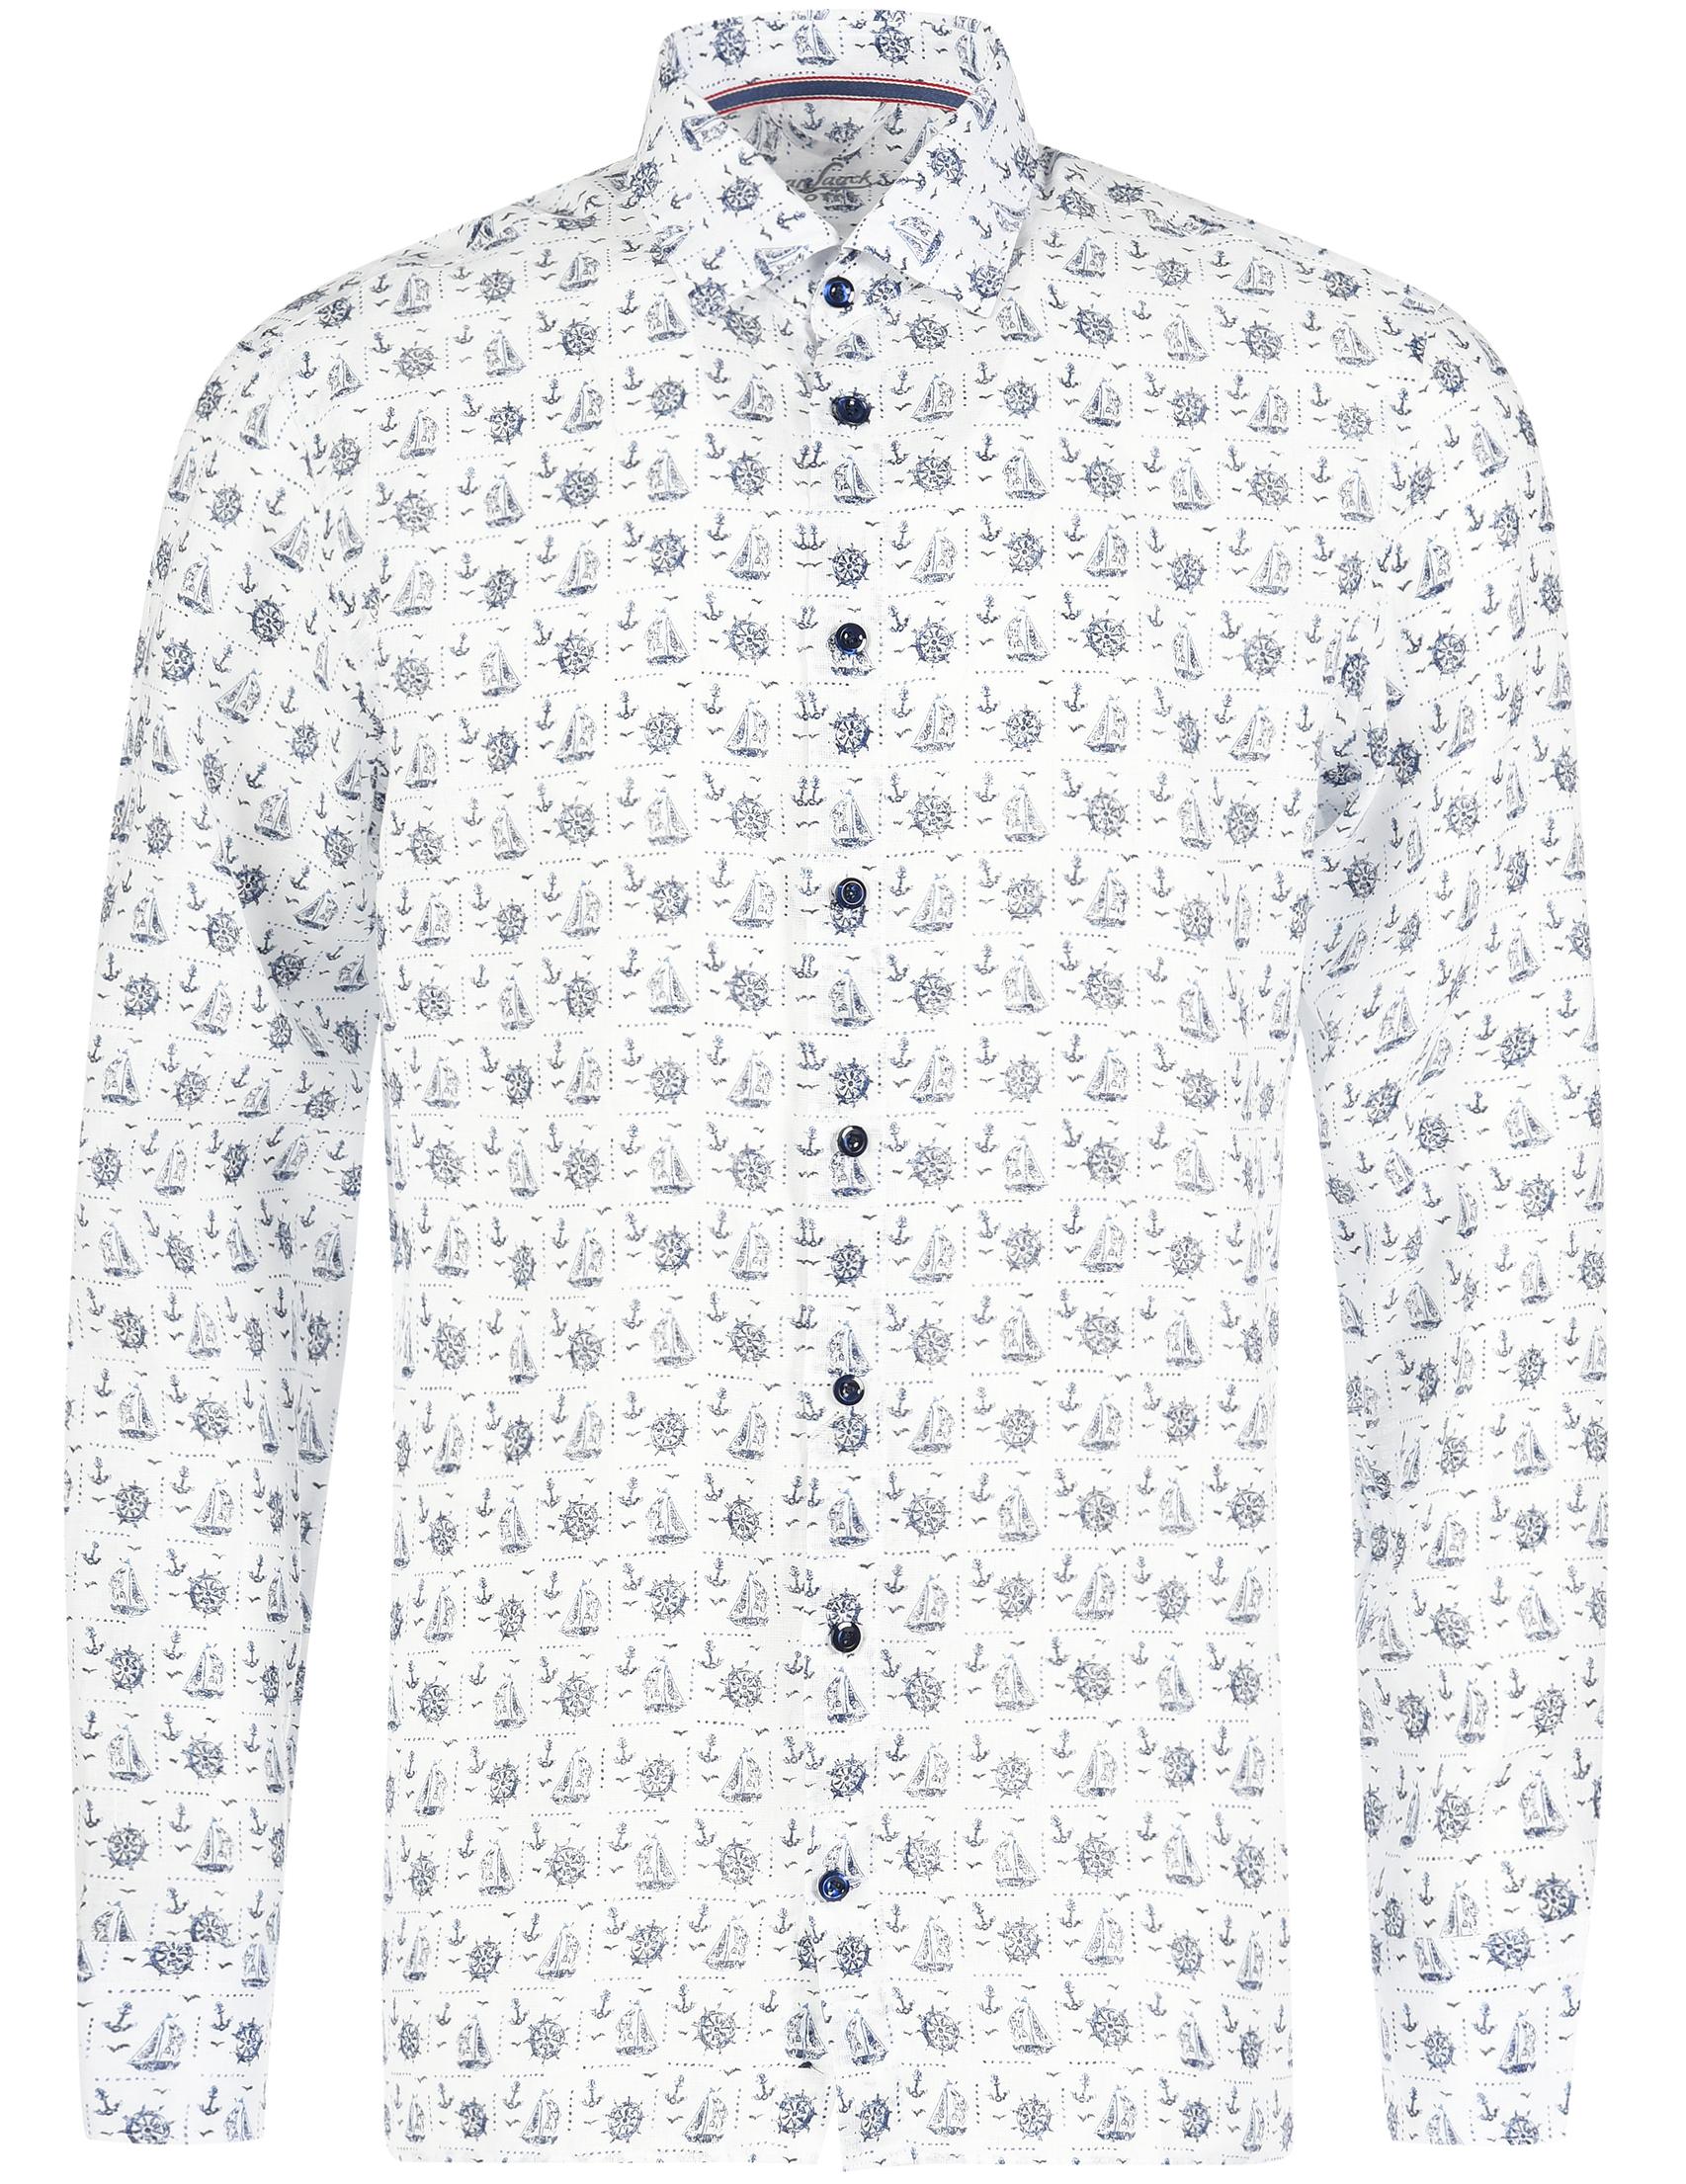 Купить Рубашки, Рубашка, VAN LAACK, Белый, 100%Лен, Весна-Лето